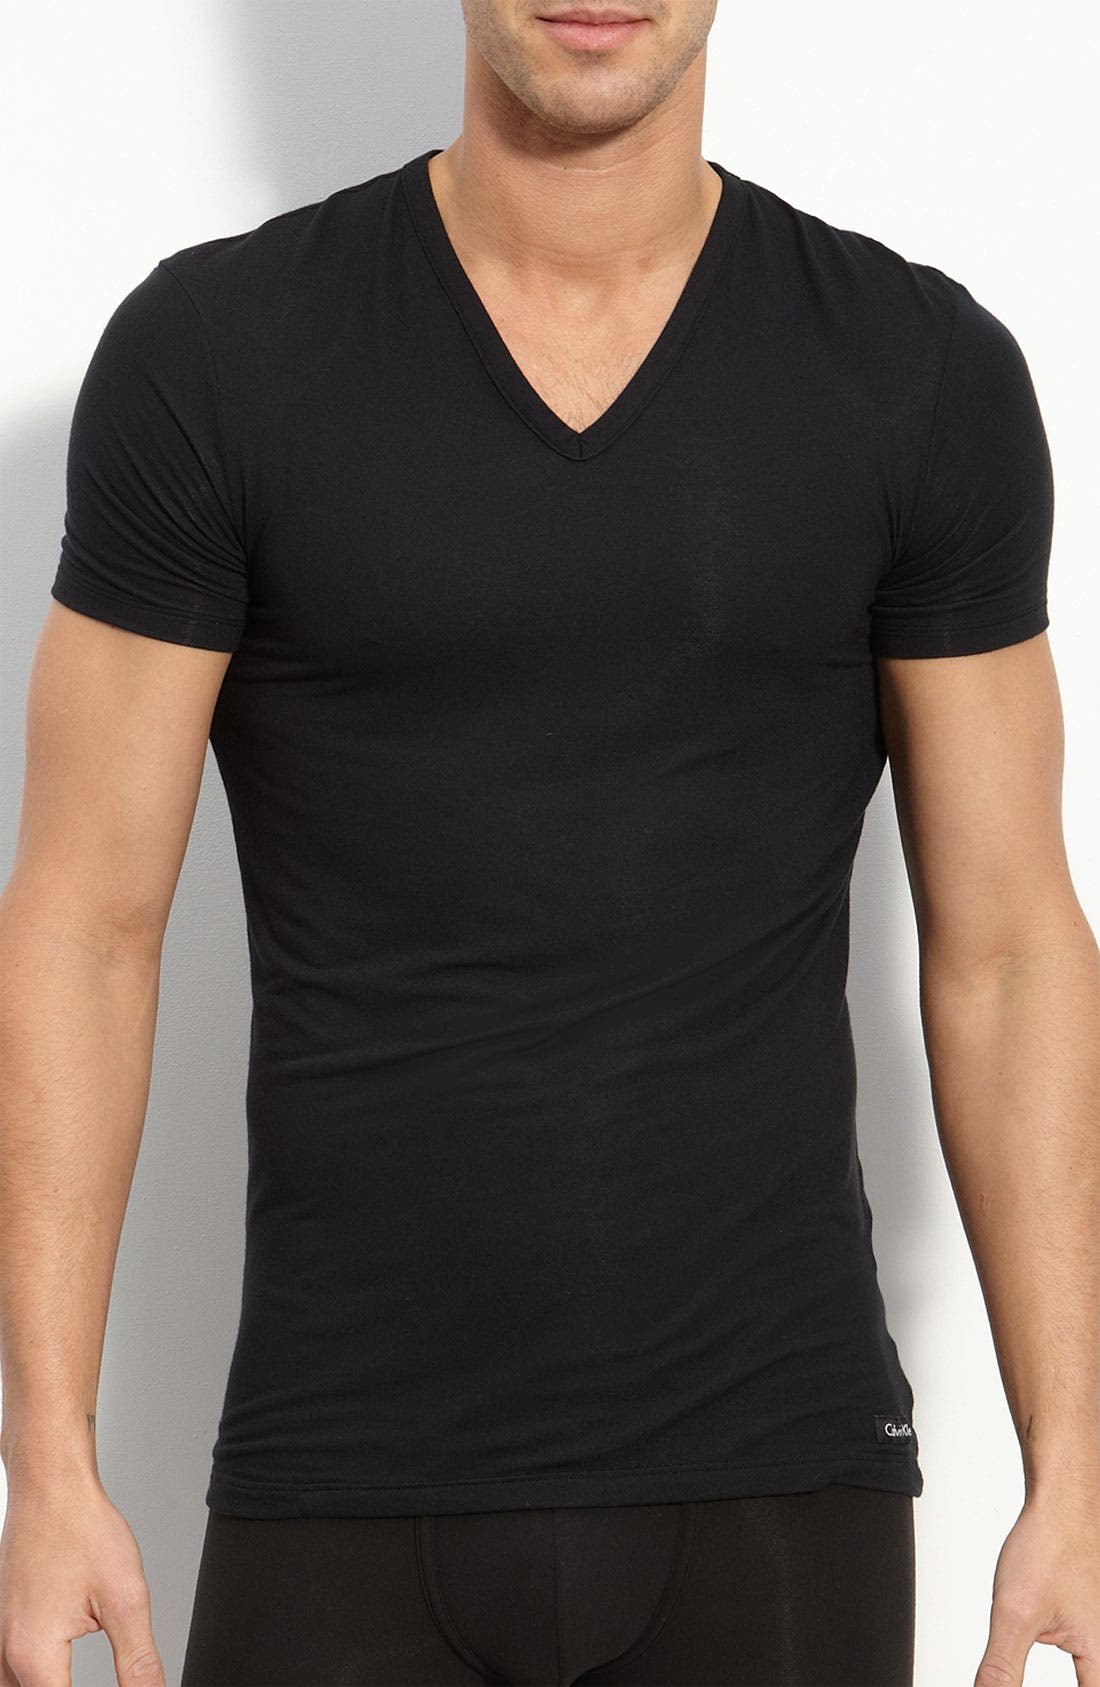 'u5563' V Neck Micromodal T Shirt by Calvin Klein